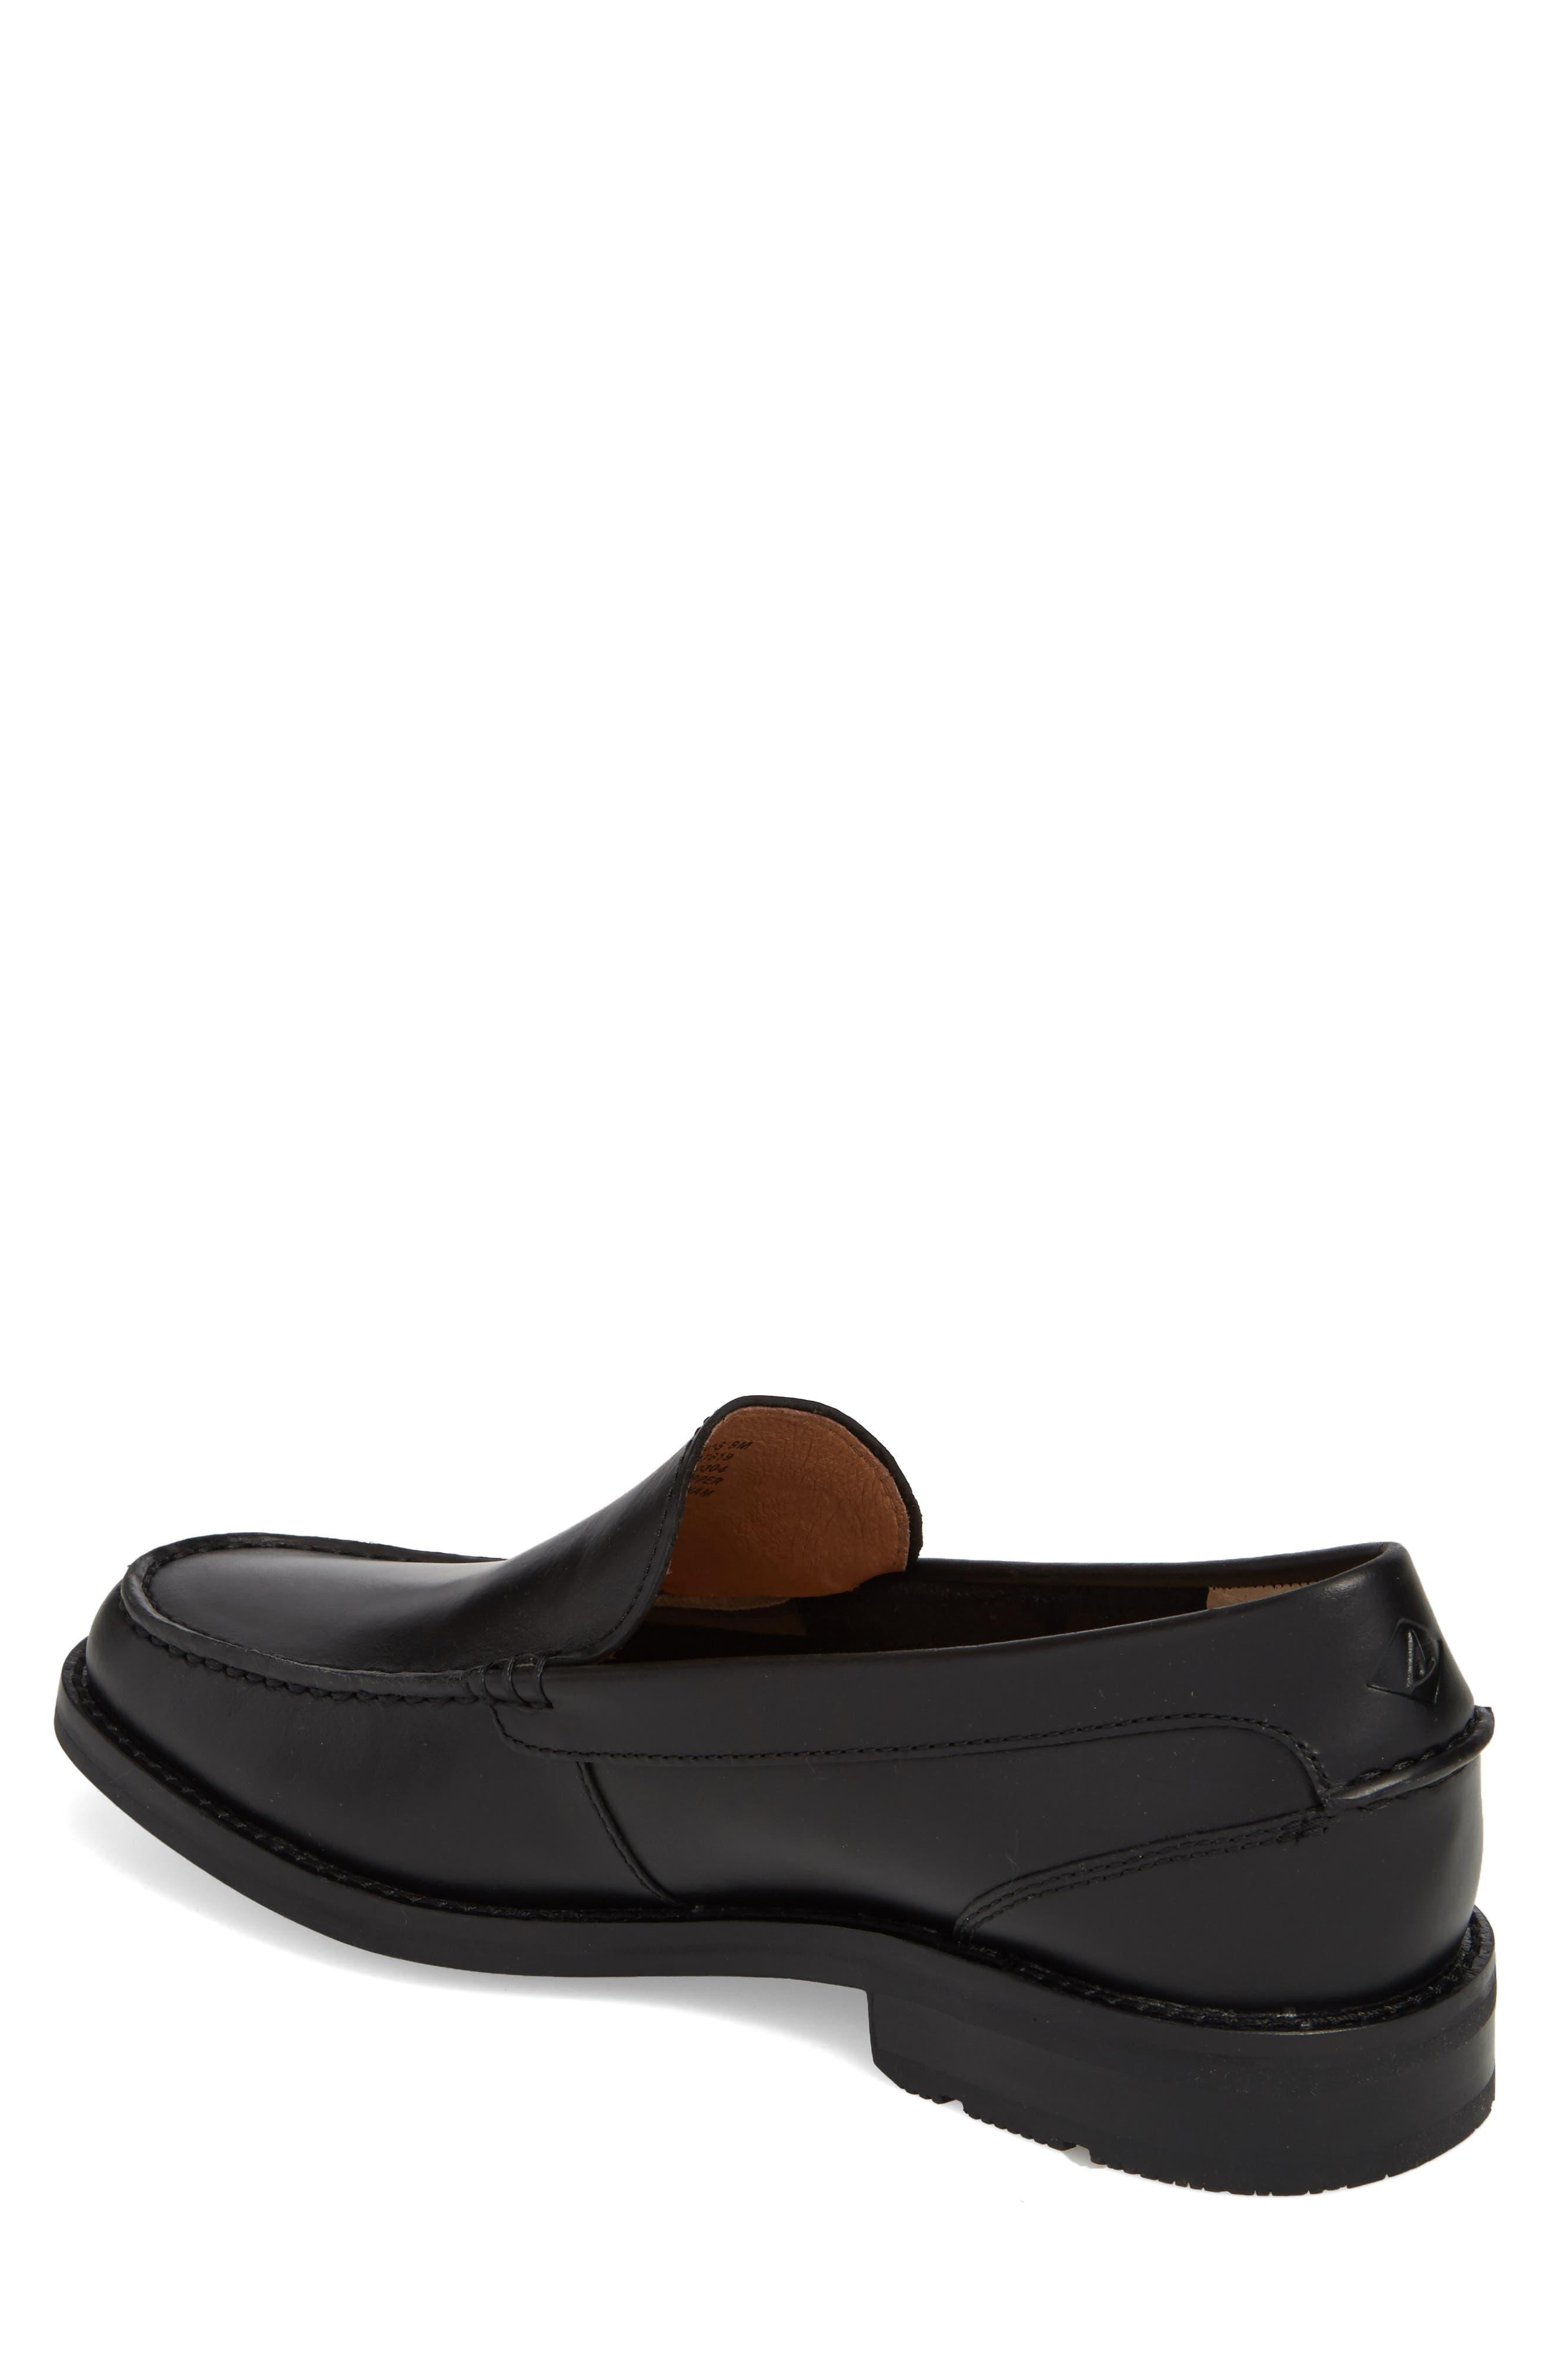 Essex Venetian Loafer,                             Alternate thumbnail 2, color,                             BLACK LEATHER